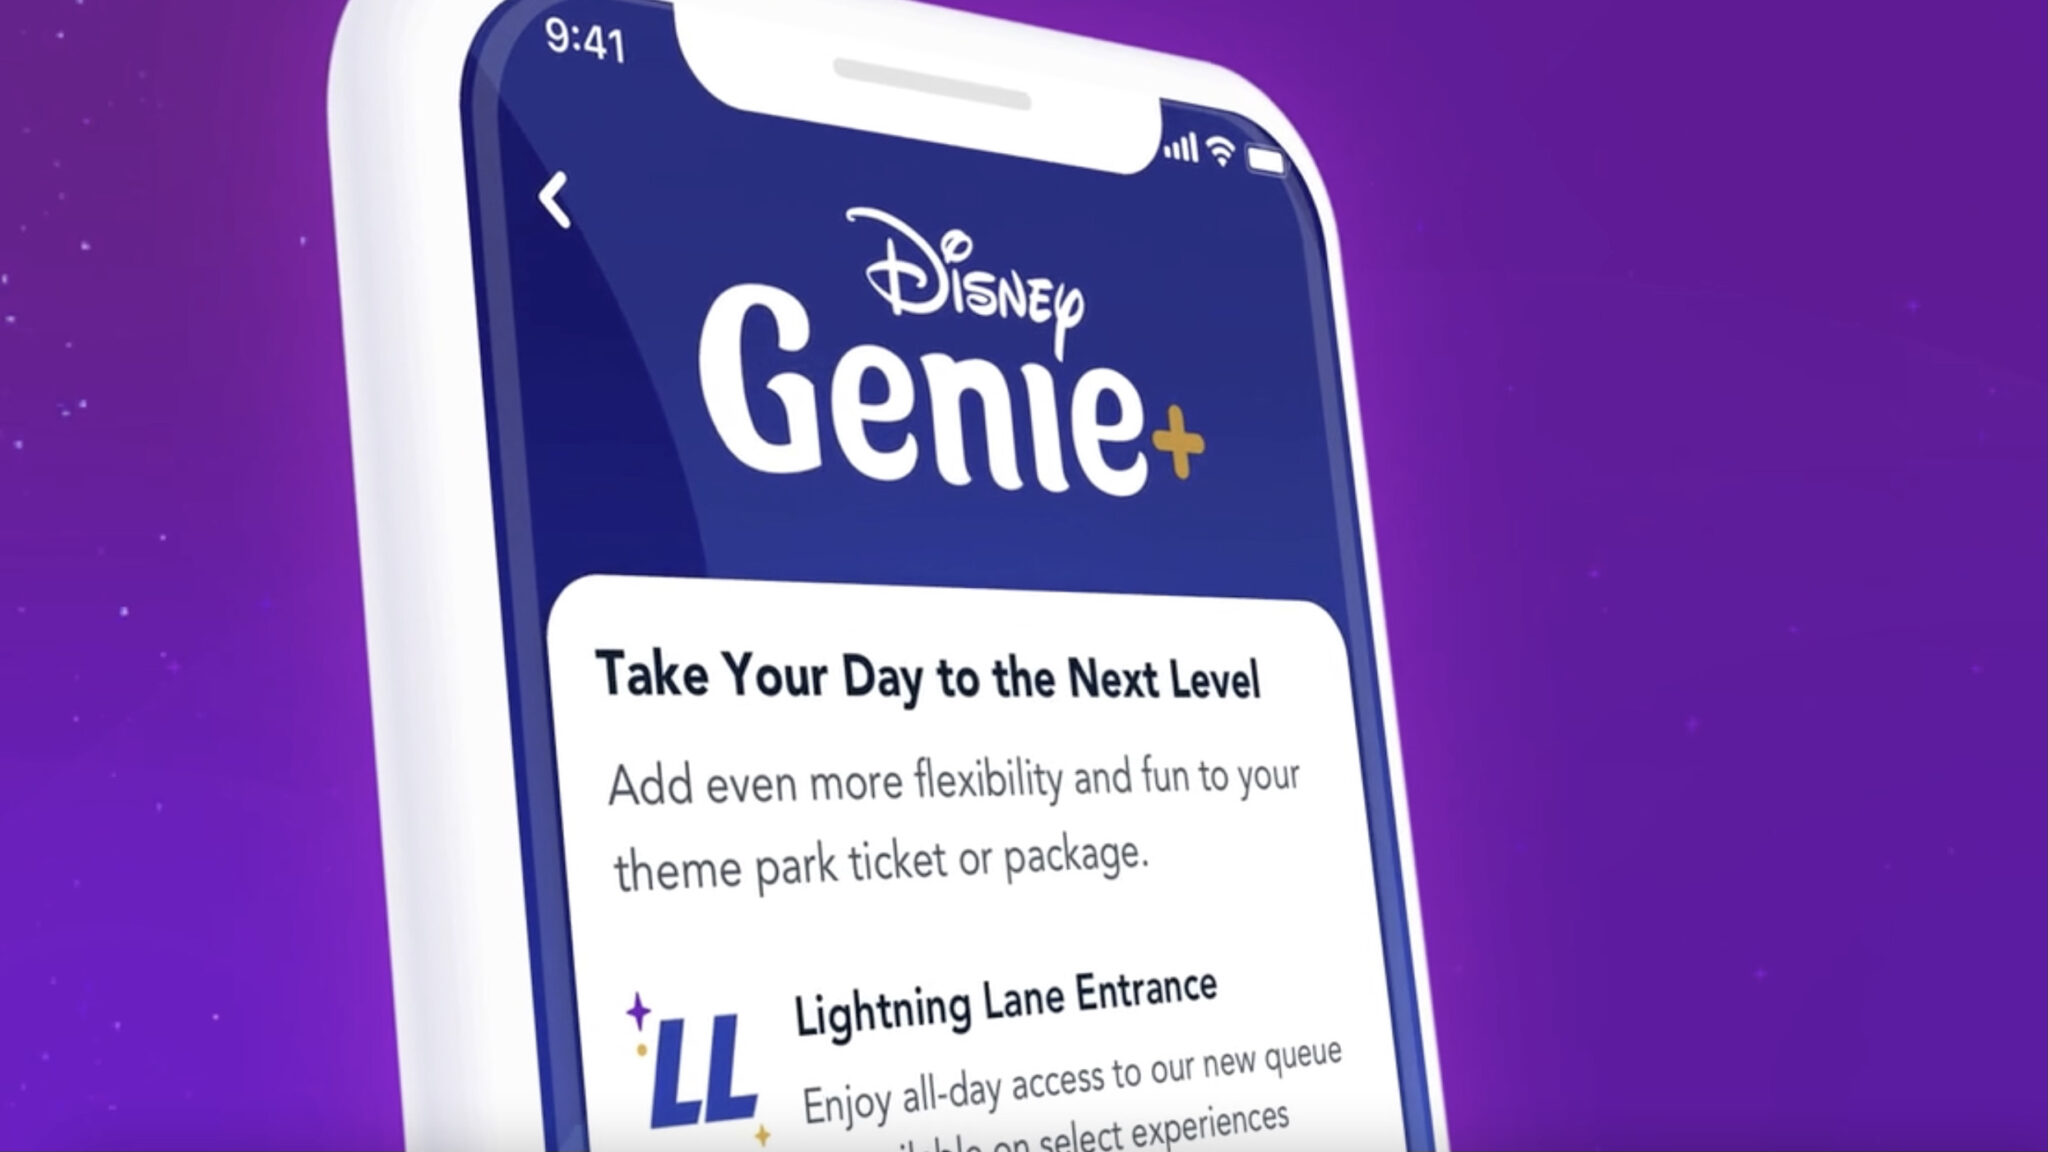 Theme Park Upgrades - Genie